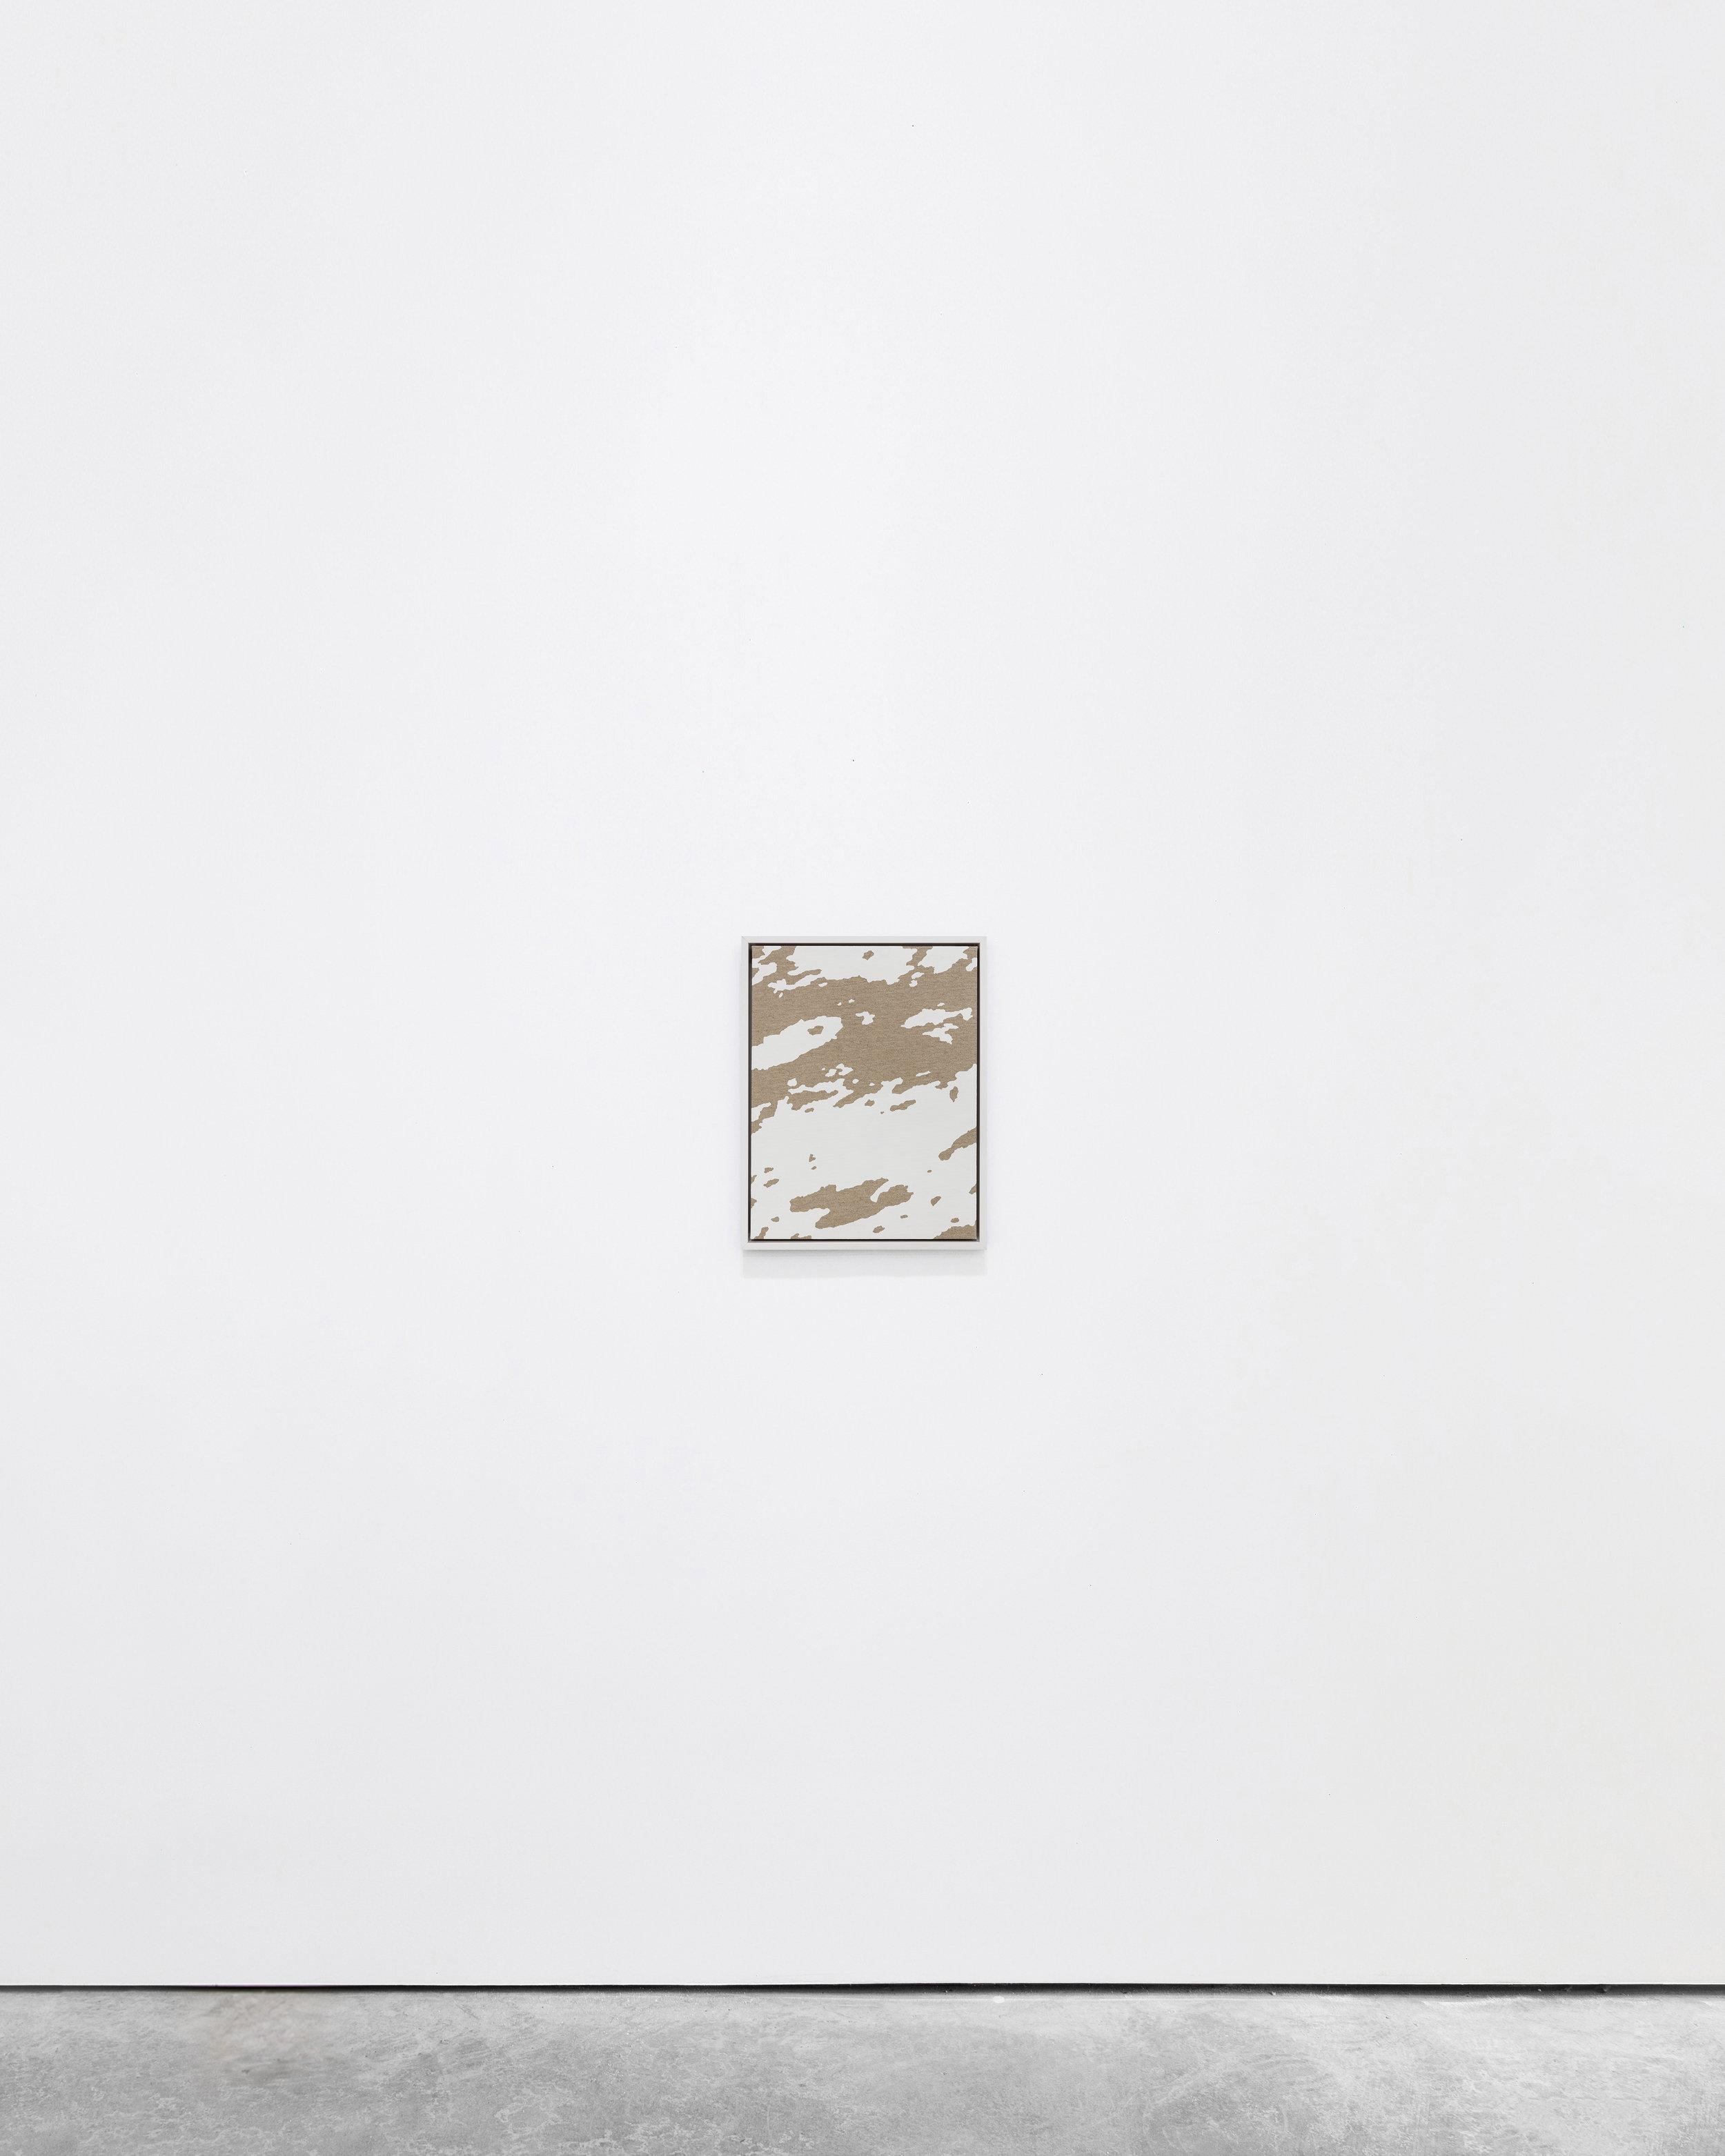 Pedro Matos  Fixed Income,  2016 Acrylic enamel on unprimed linen, wood frame 40 x 30 cm